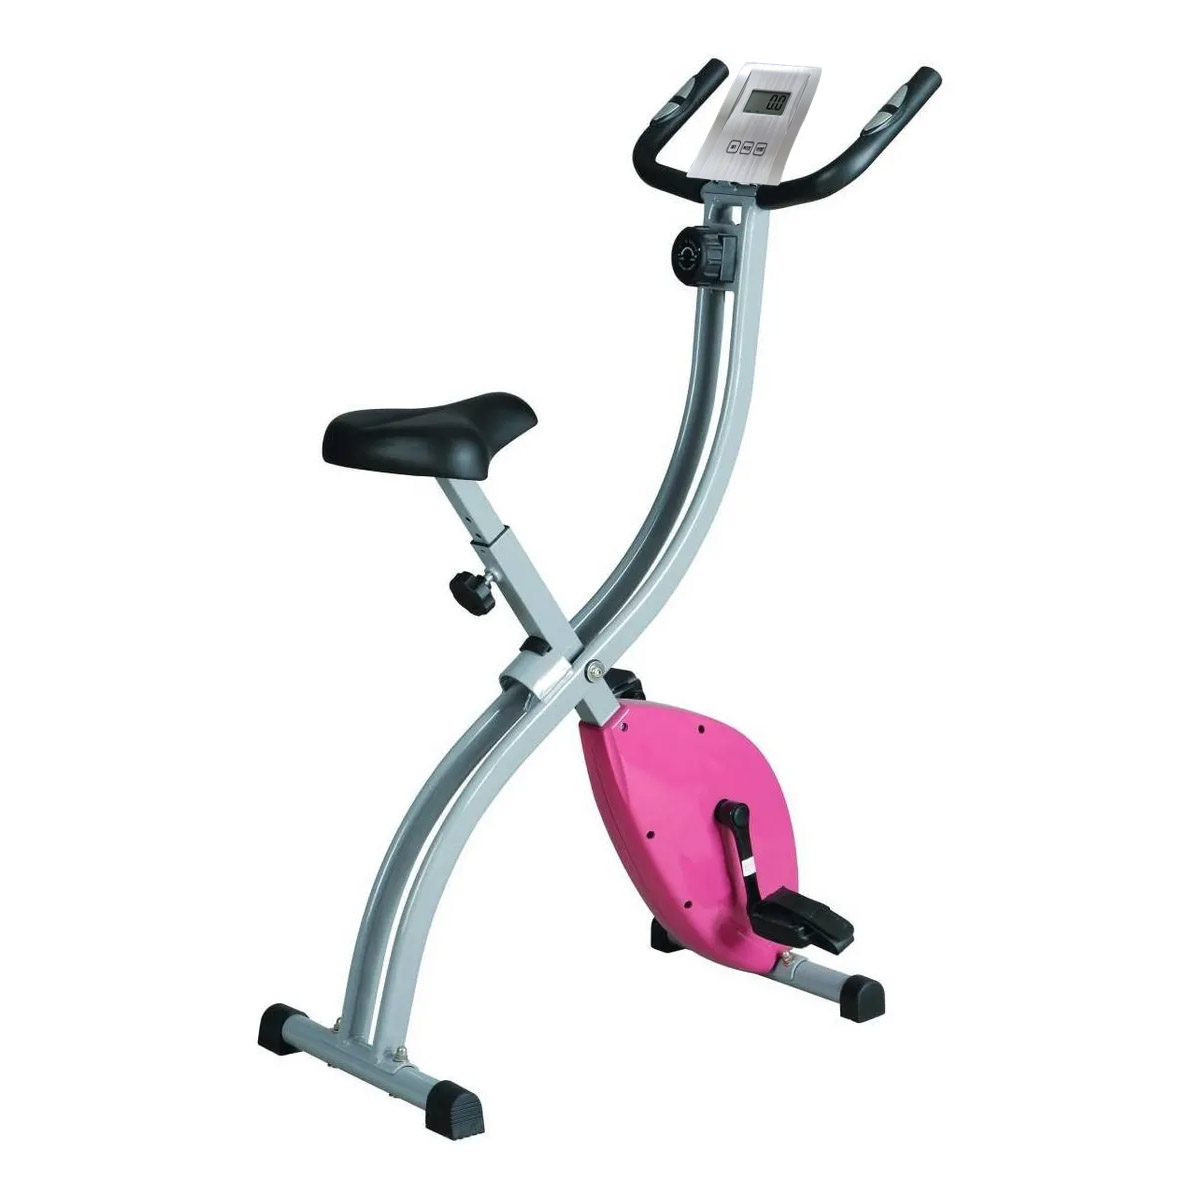 Bicicleta Vertical De Ejercicio Fija Magnetica Idea Fitness